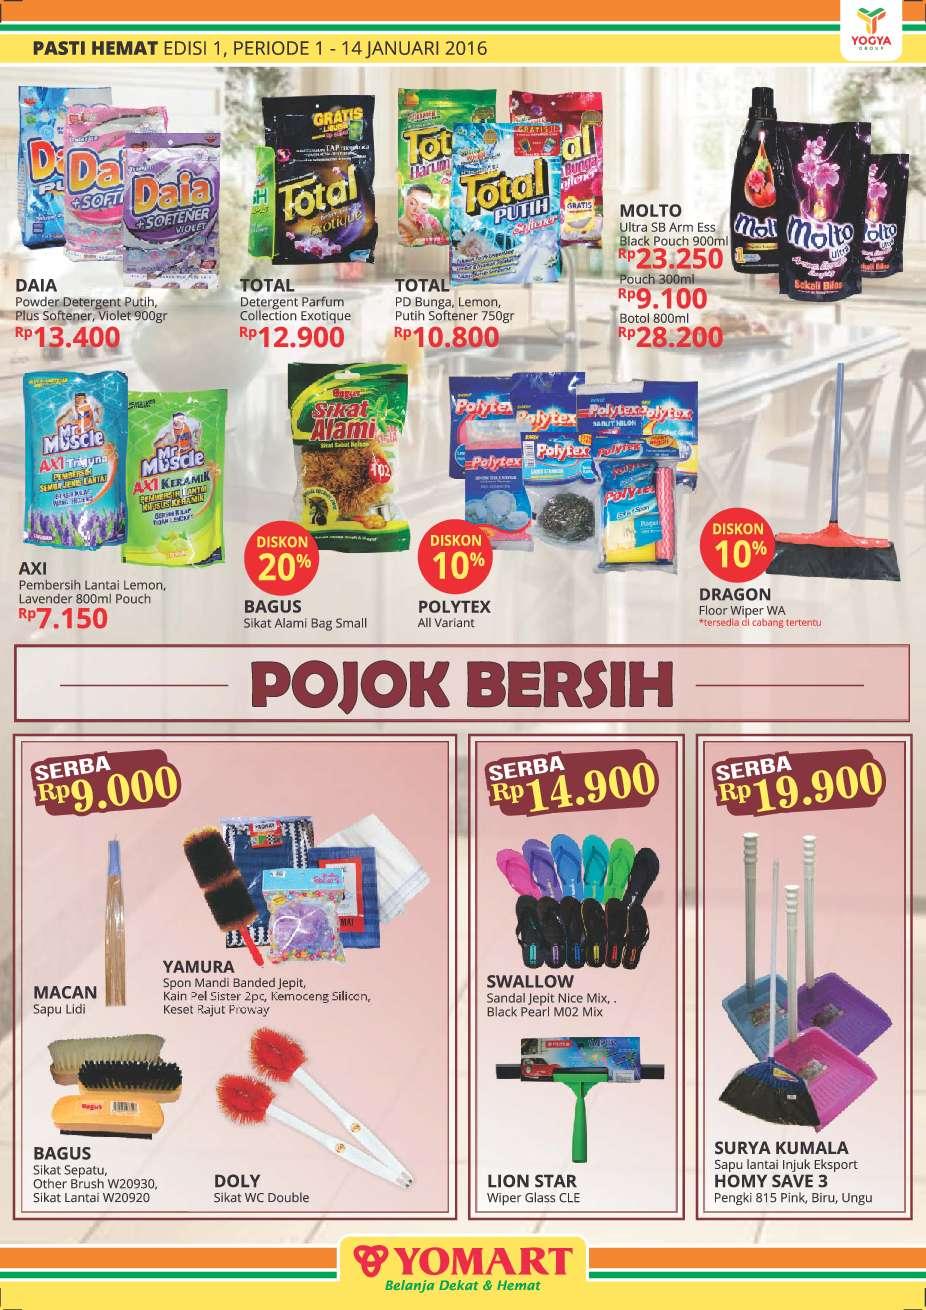 Jual Majalah Pasti Hemat Yomart Ed 01 Januari 2016 Gramedia Daia Softergent Violet 3